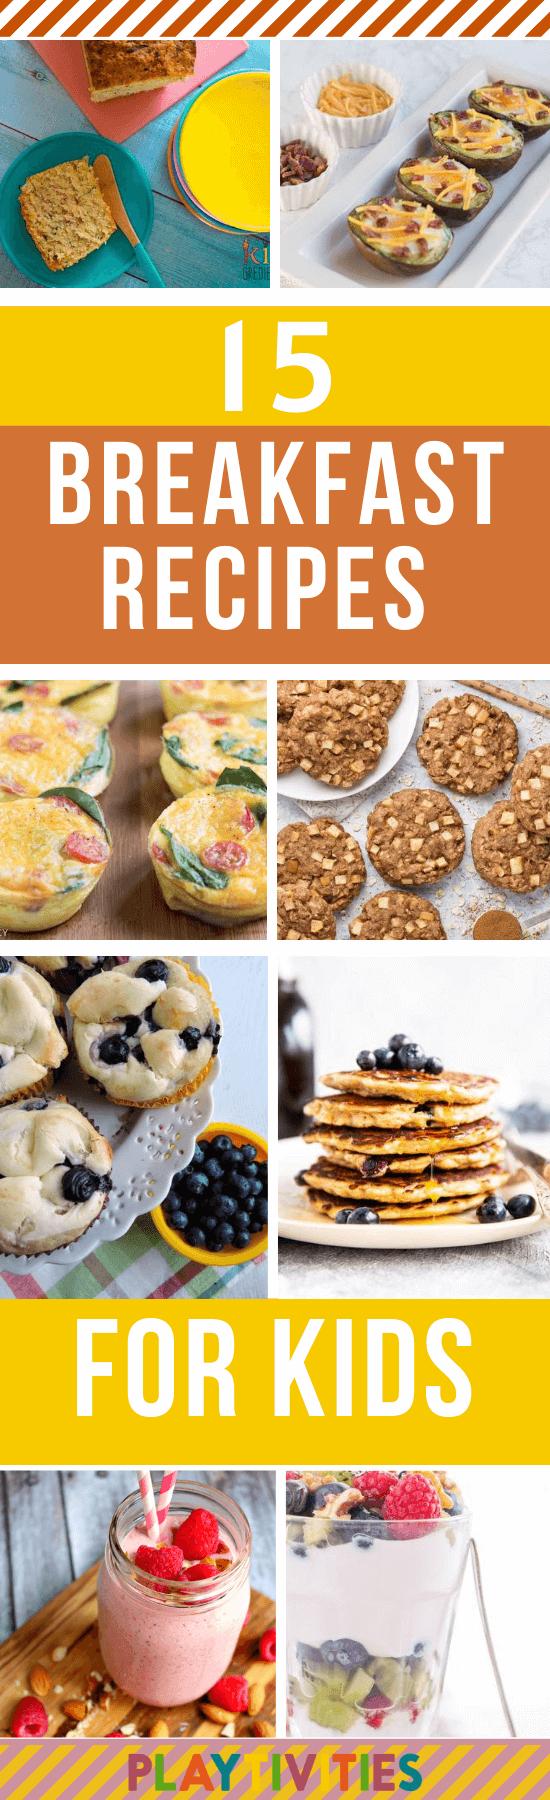 Breakfast Recipes for Kids